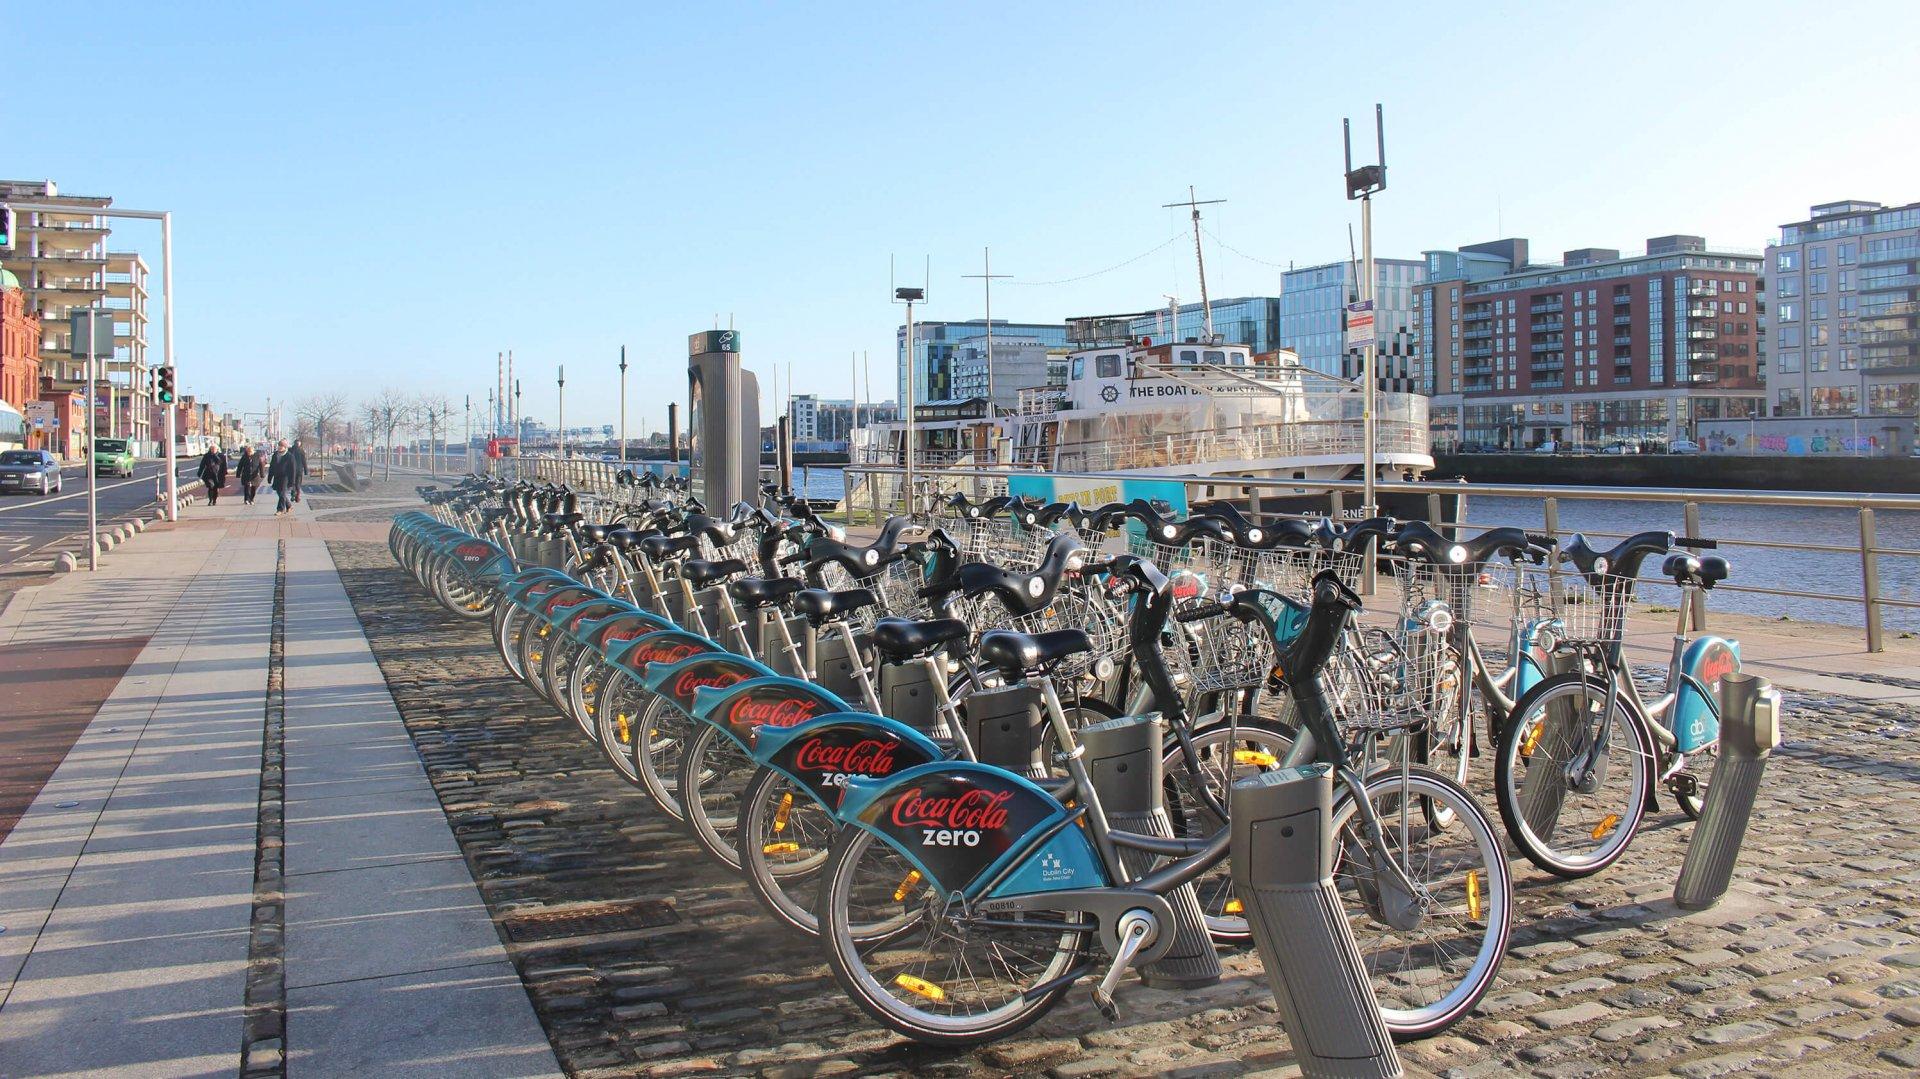 Dublin Bikes docking station on the River Liffey